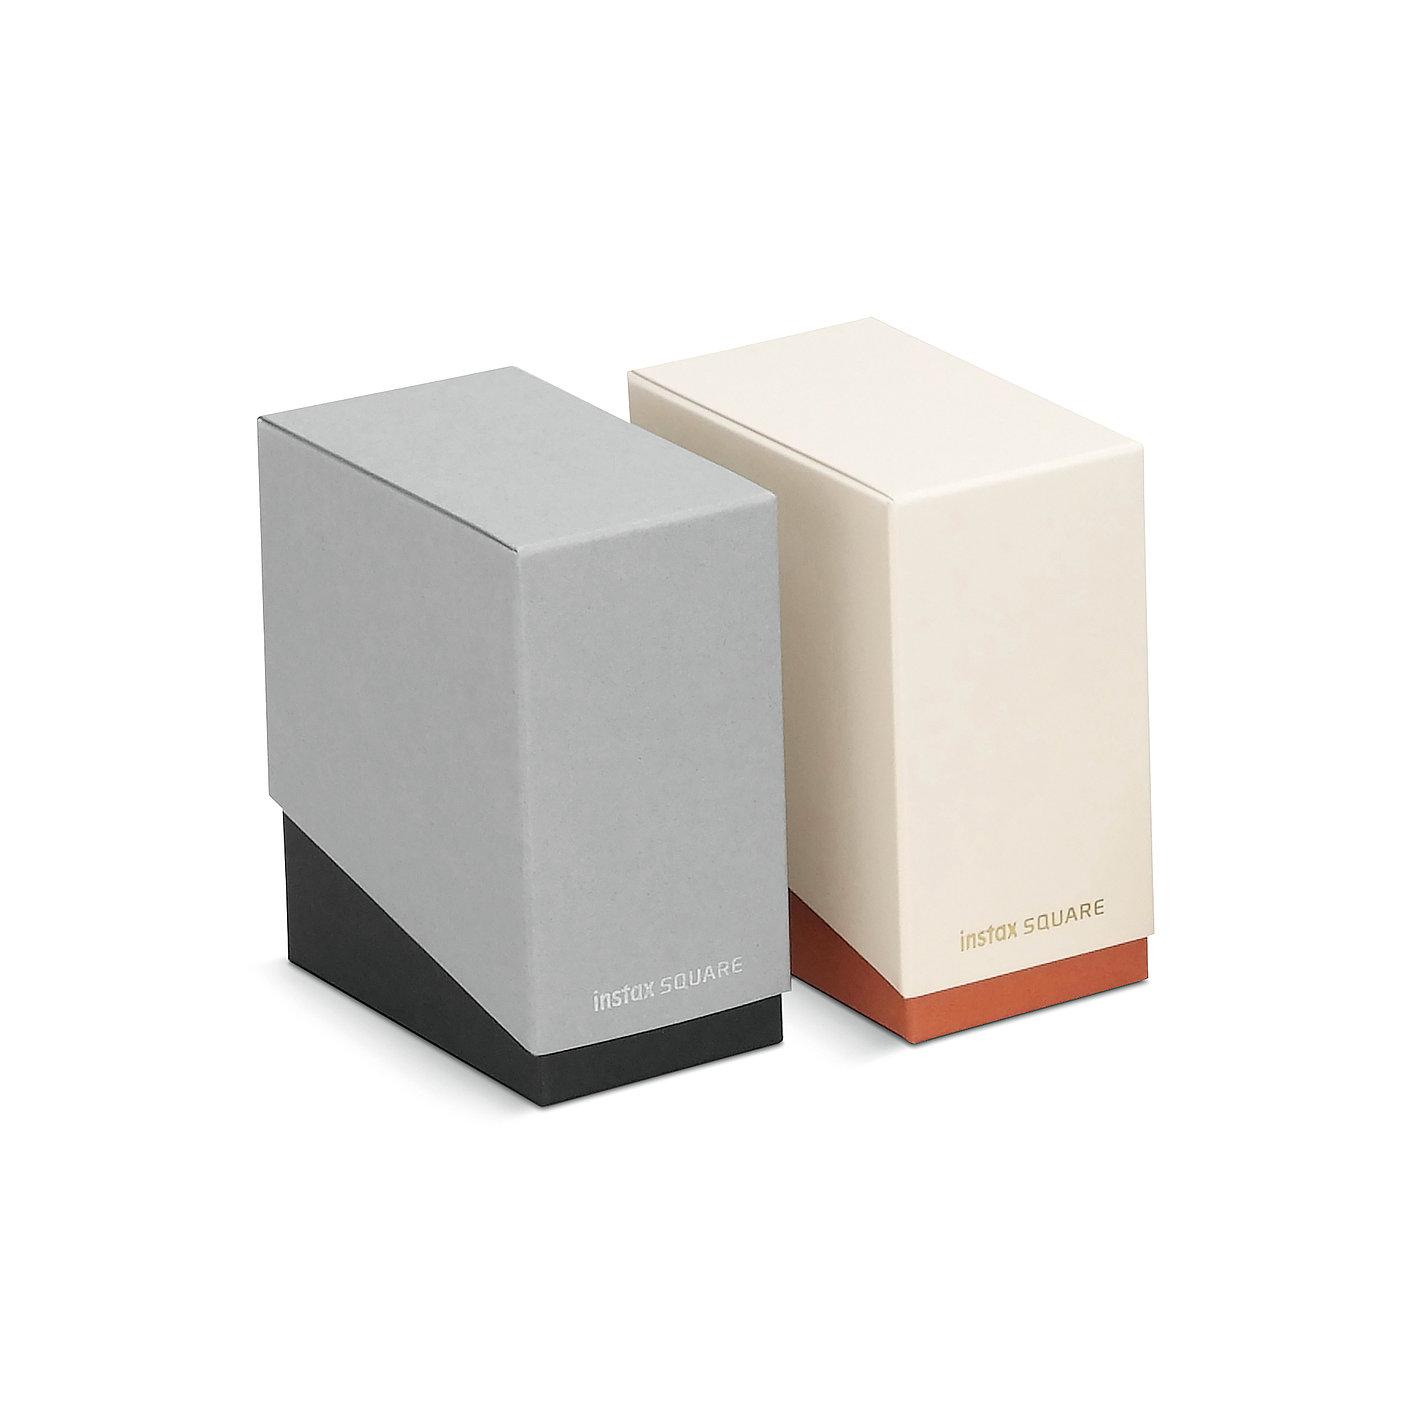 instax SQUARE FILM PAPER BOX | Red Dot Design Award